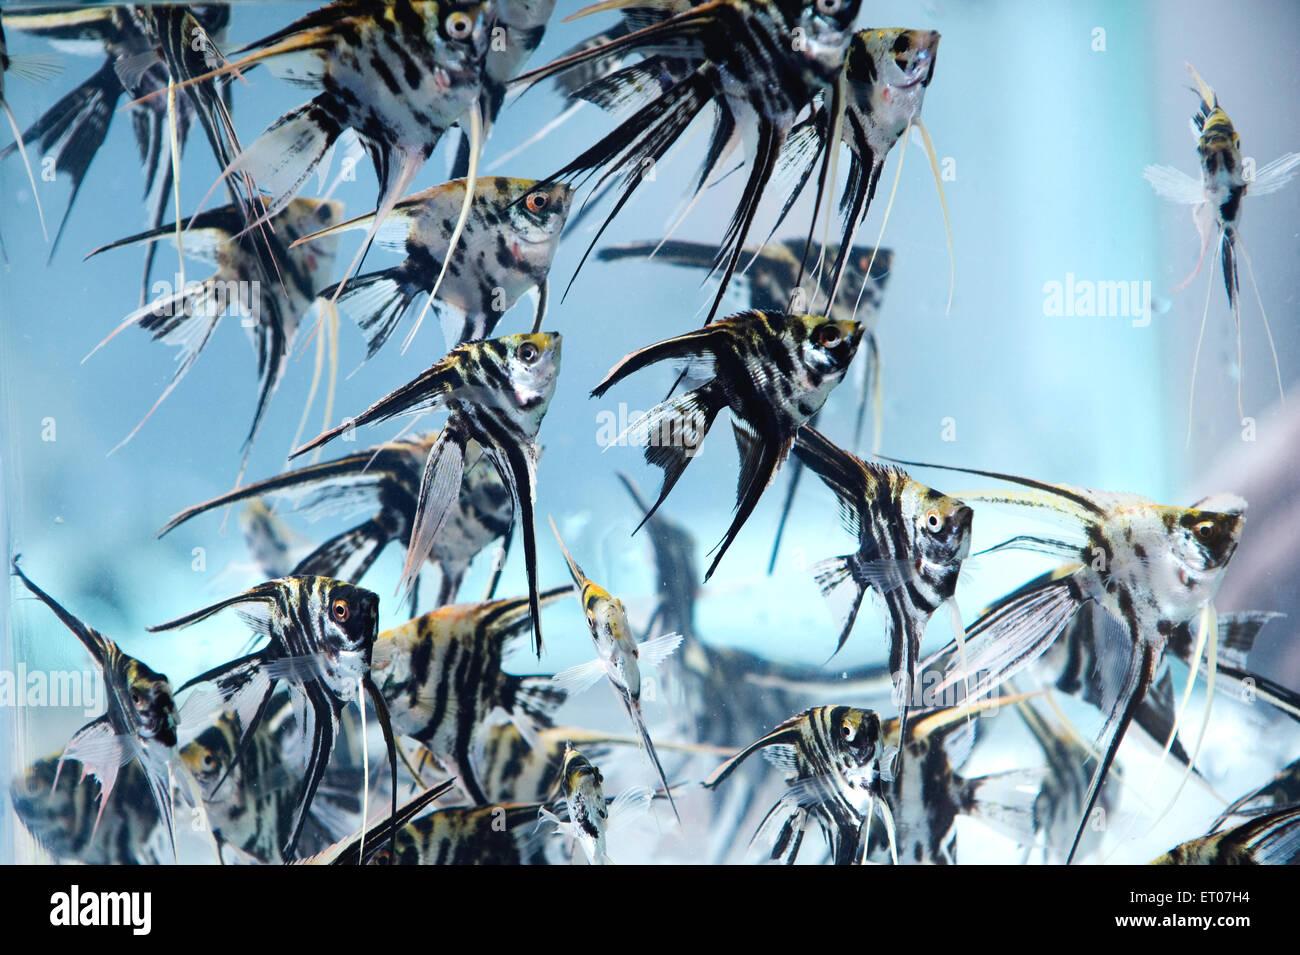 Freshwater angel fish in aquarium ; Calcutta Kolkata ; West Bengal ; India 14 October 2009 - Stock Image